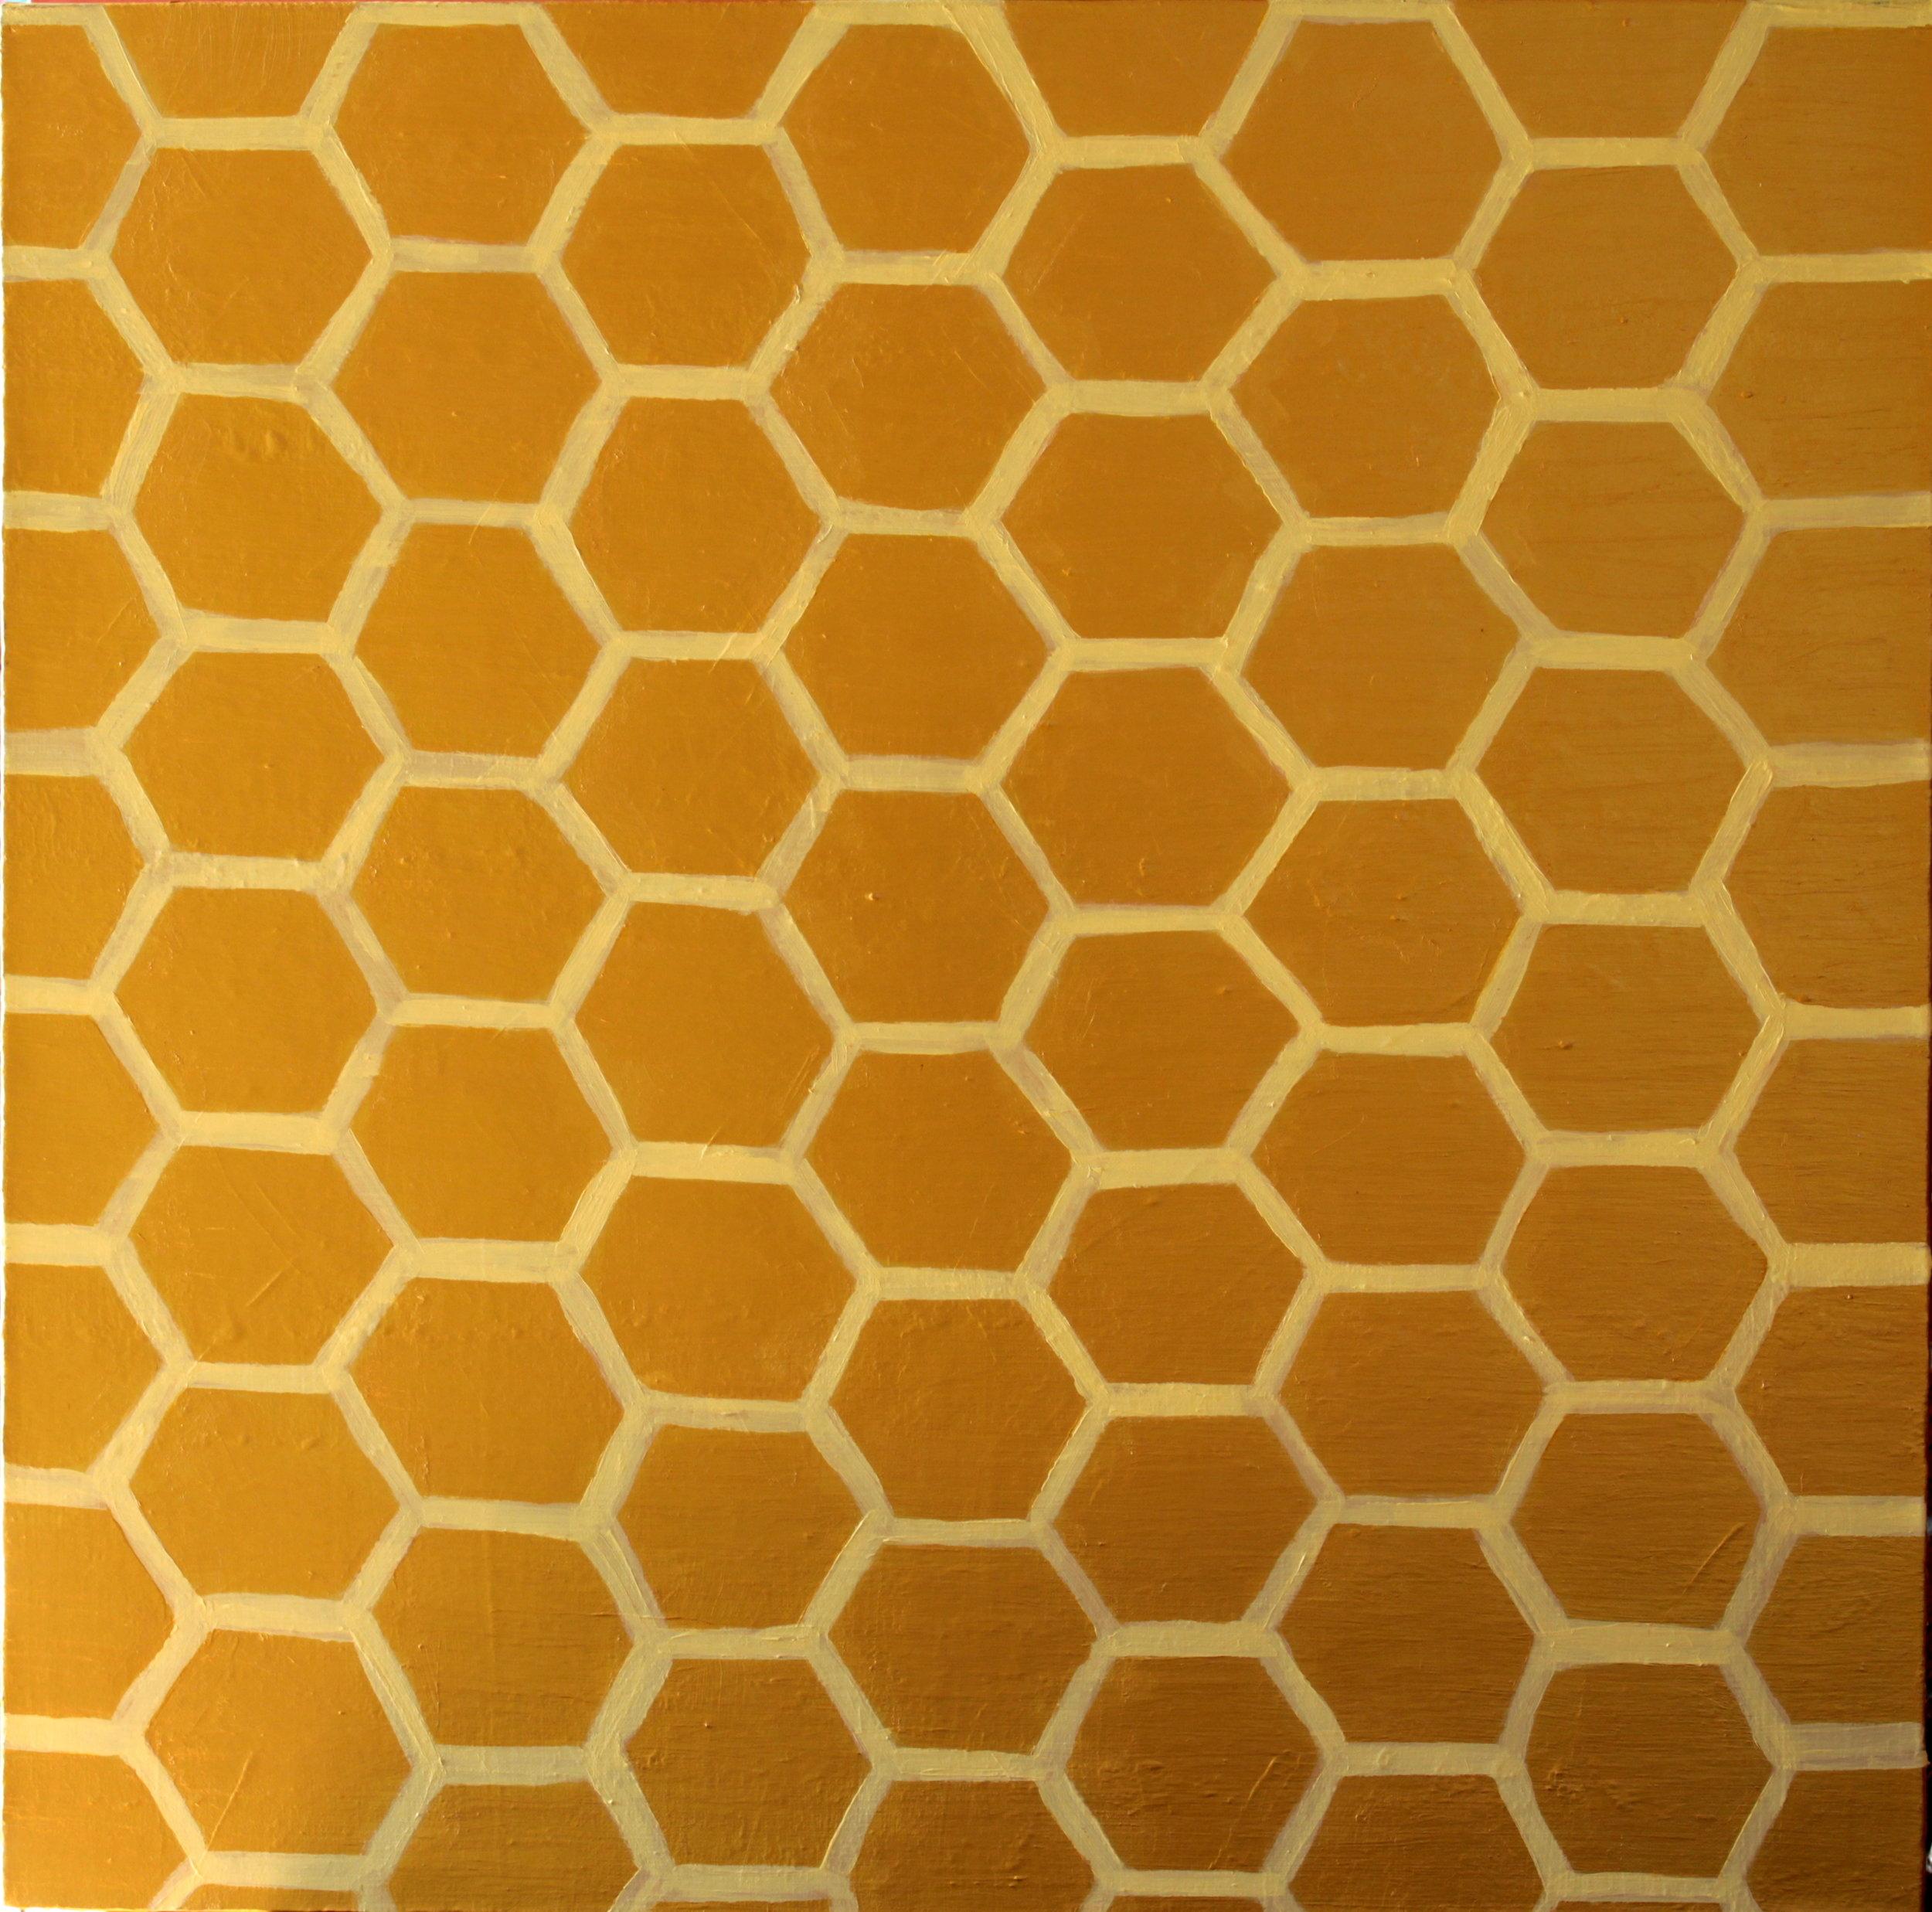 24 2013 Golden Honeycombs Acrylic on canvas 76 X 76cm Yaniv Janson.JPG